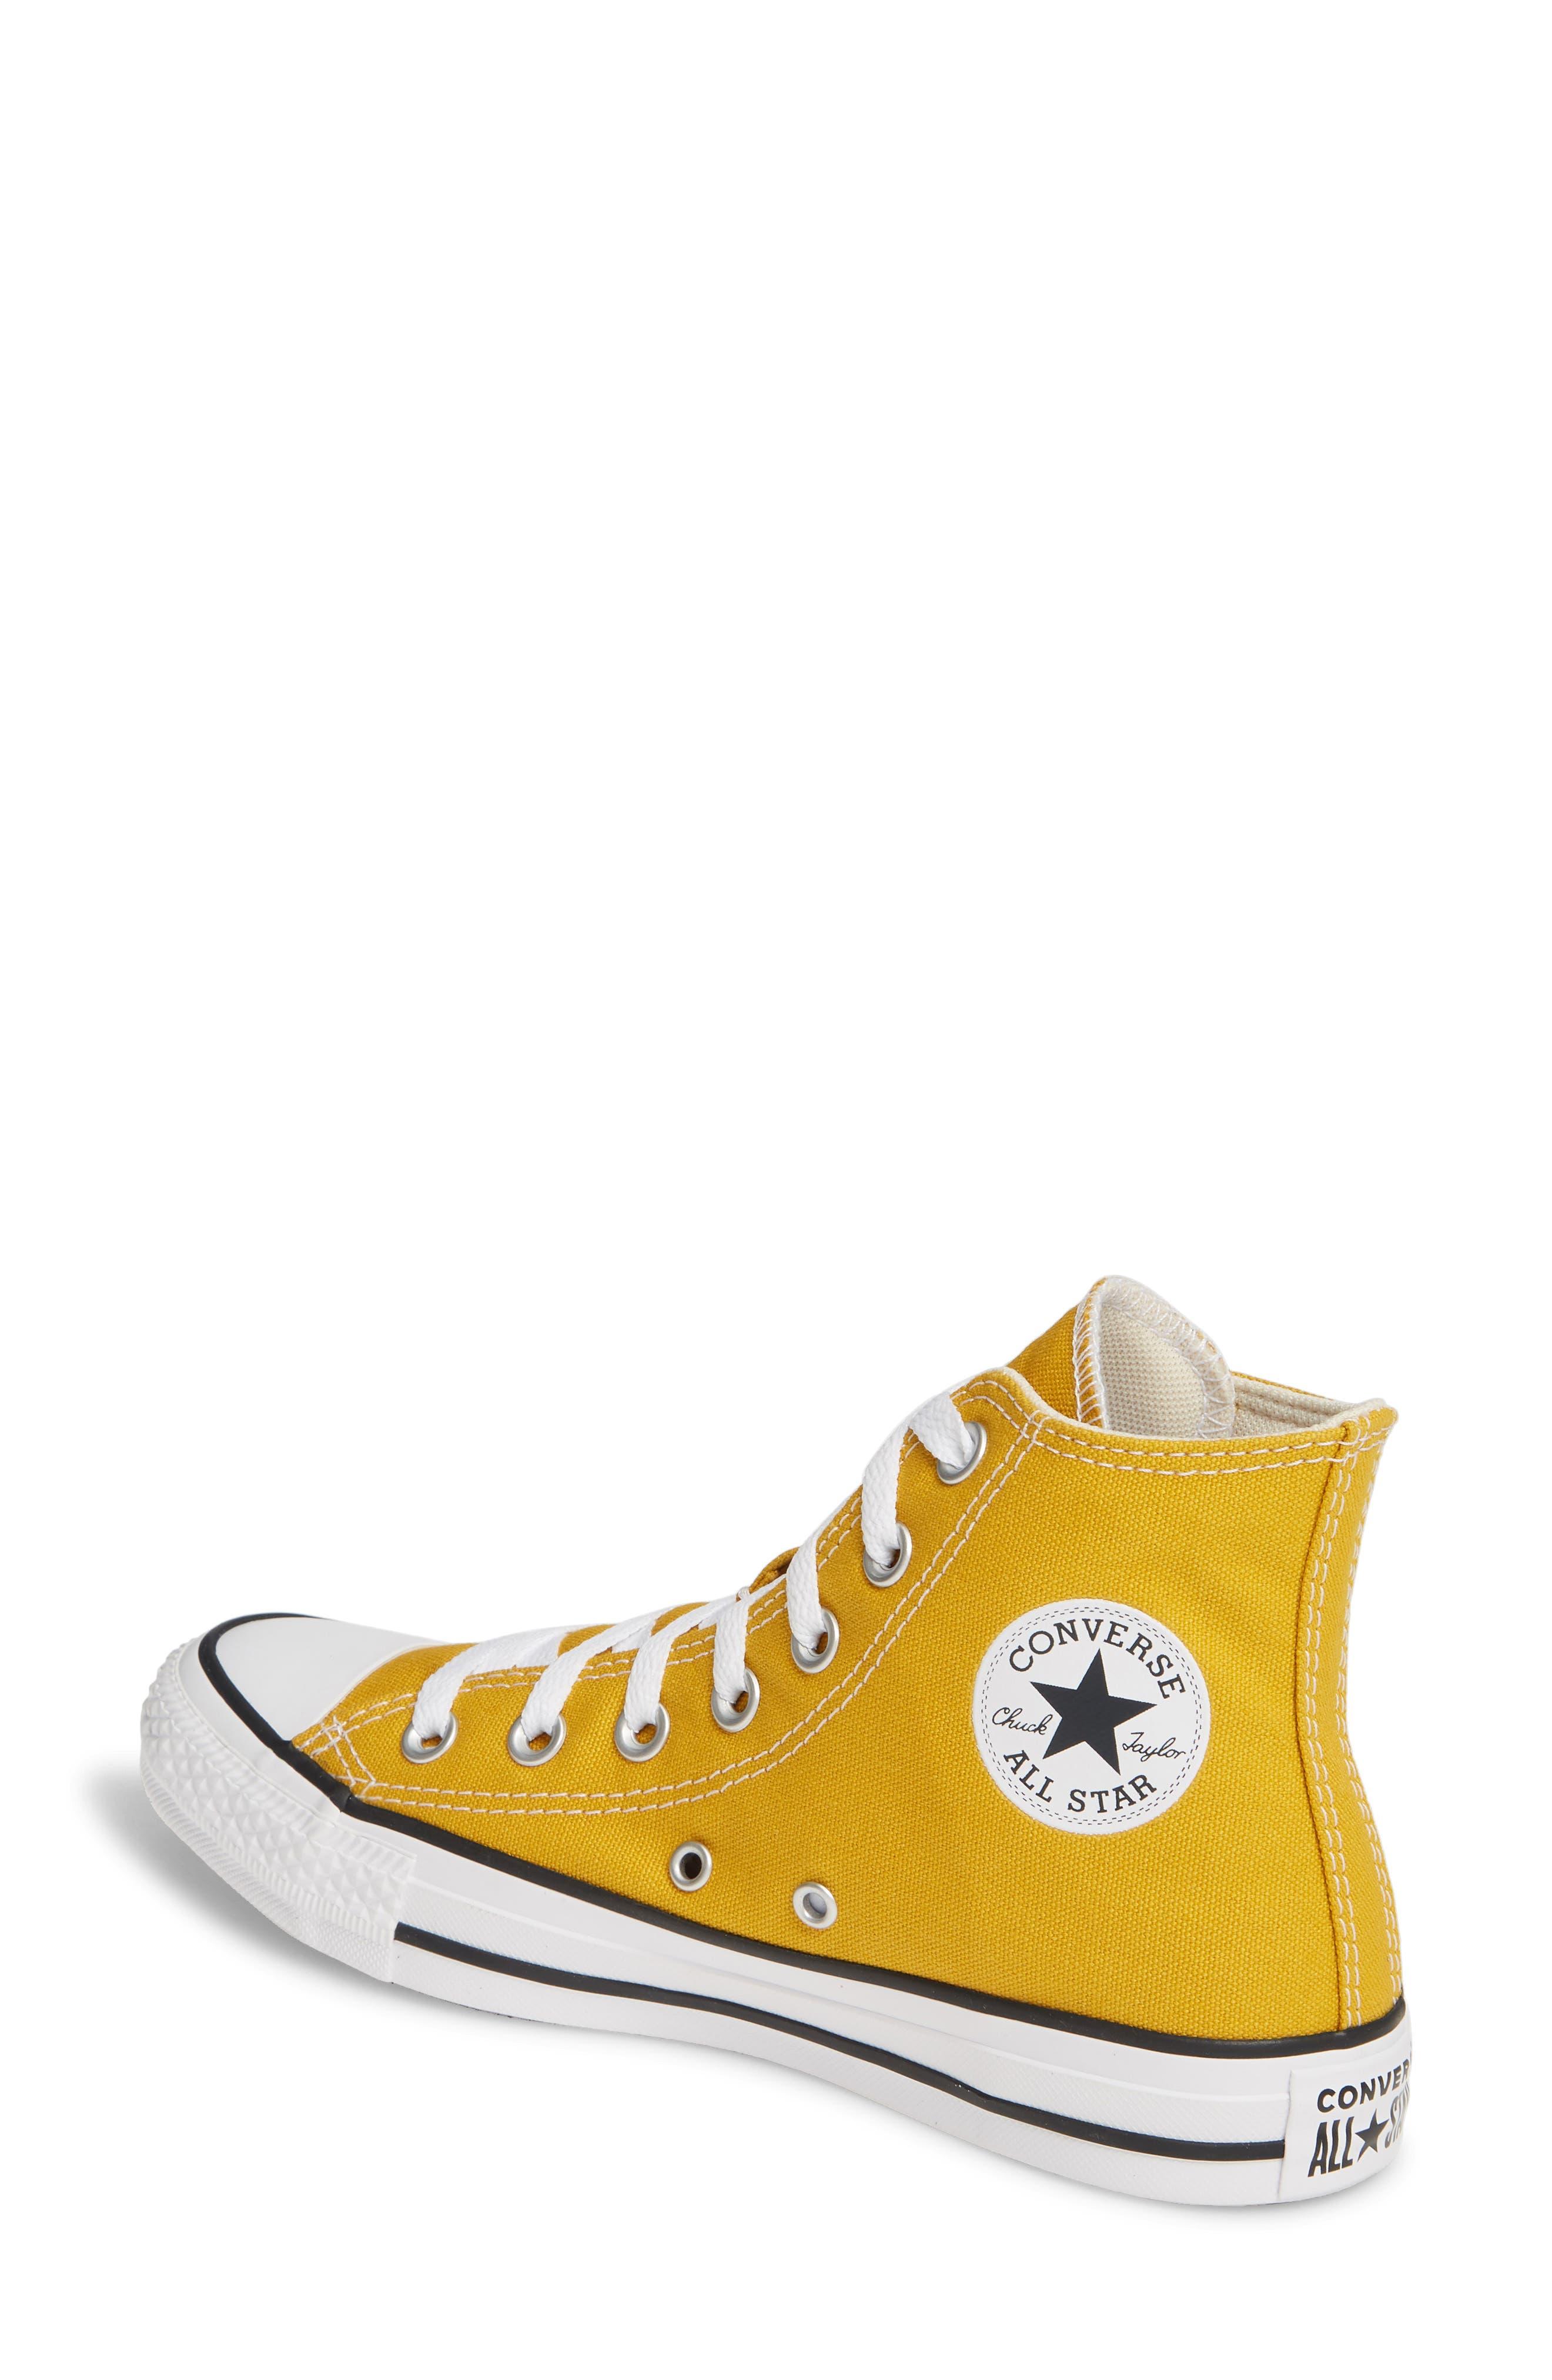 Women's Converse Shoes | Nordstrom